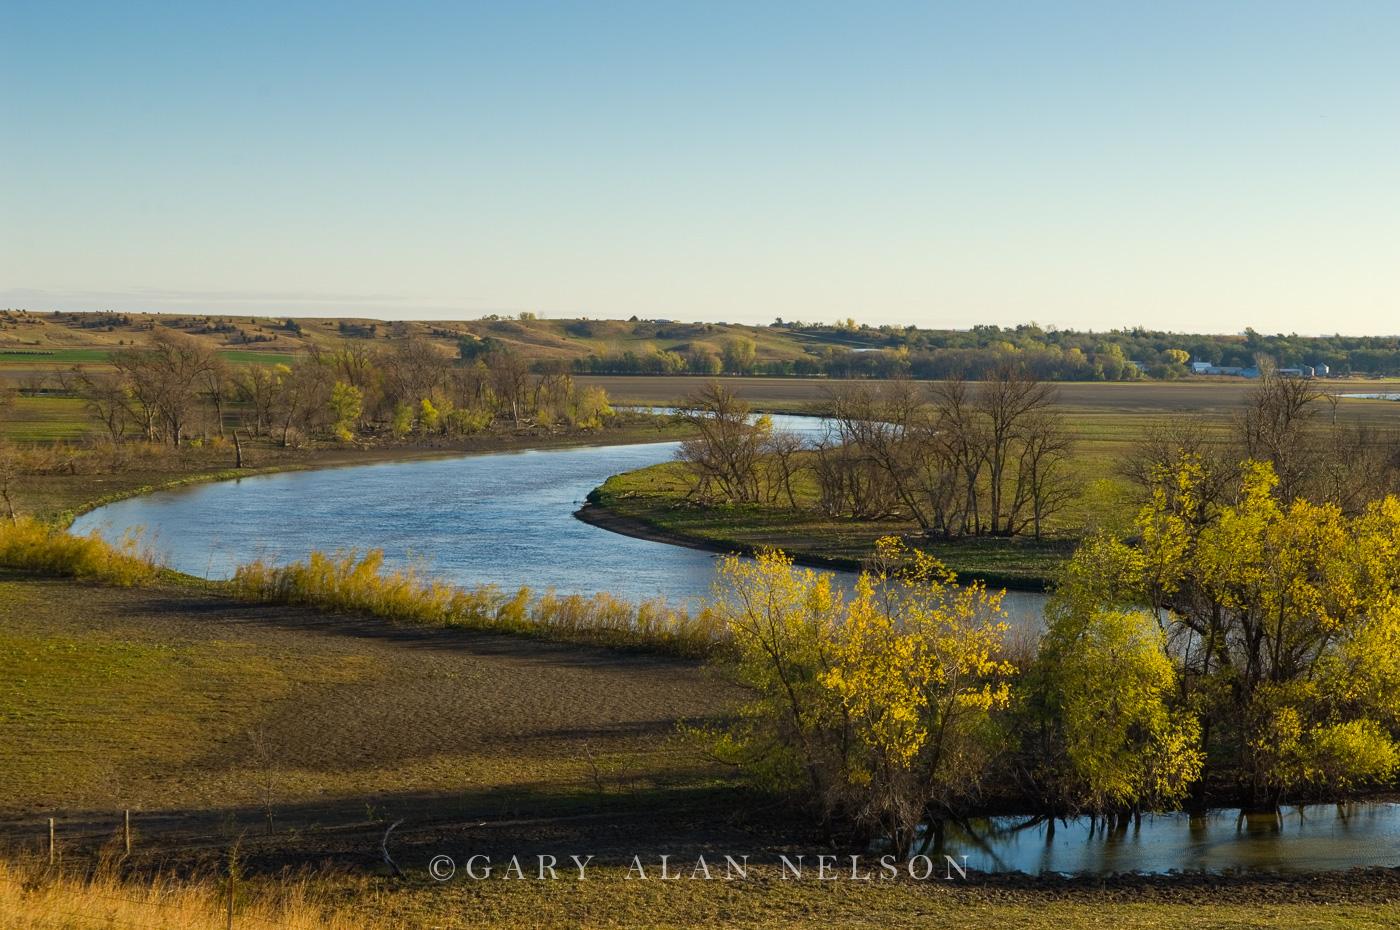 SD-11-23-SC Autumn along the James River, Hutchinson County, South Dakota